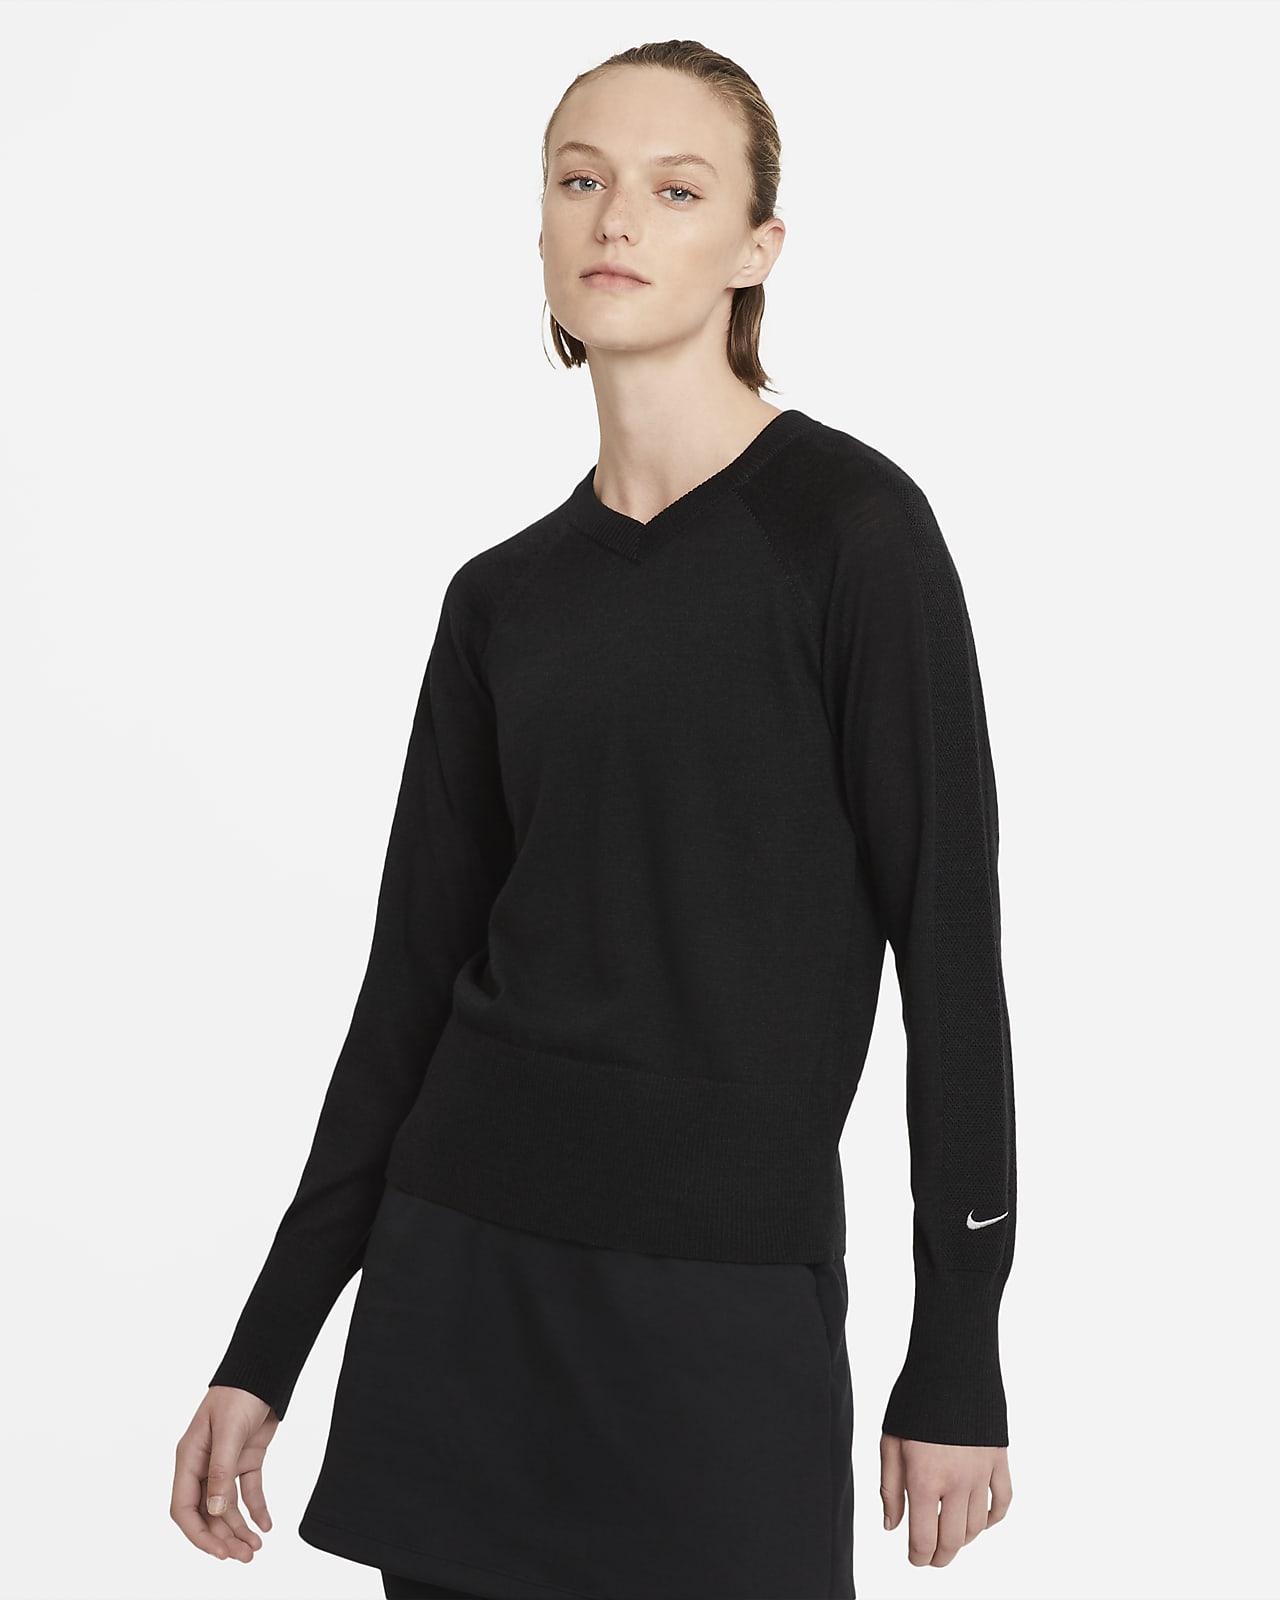 Nike Ace hosszú ujjú női golfpulóver